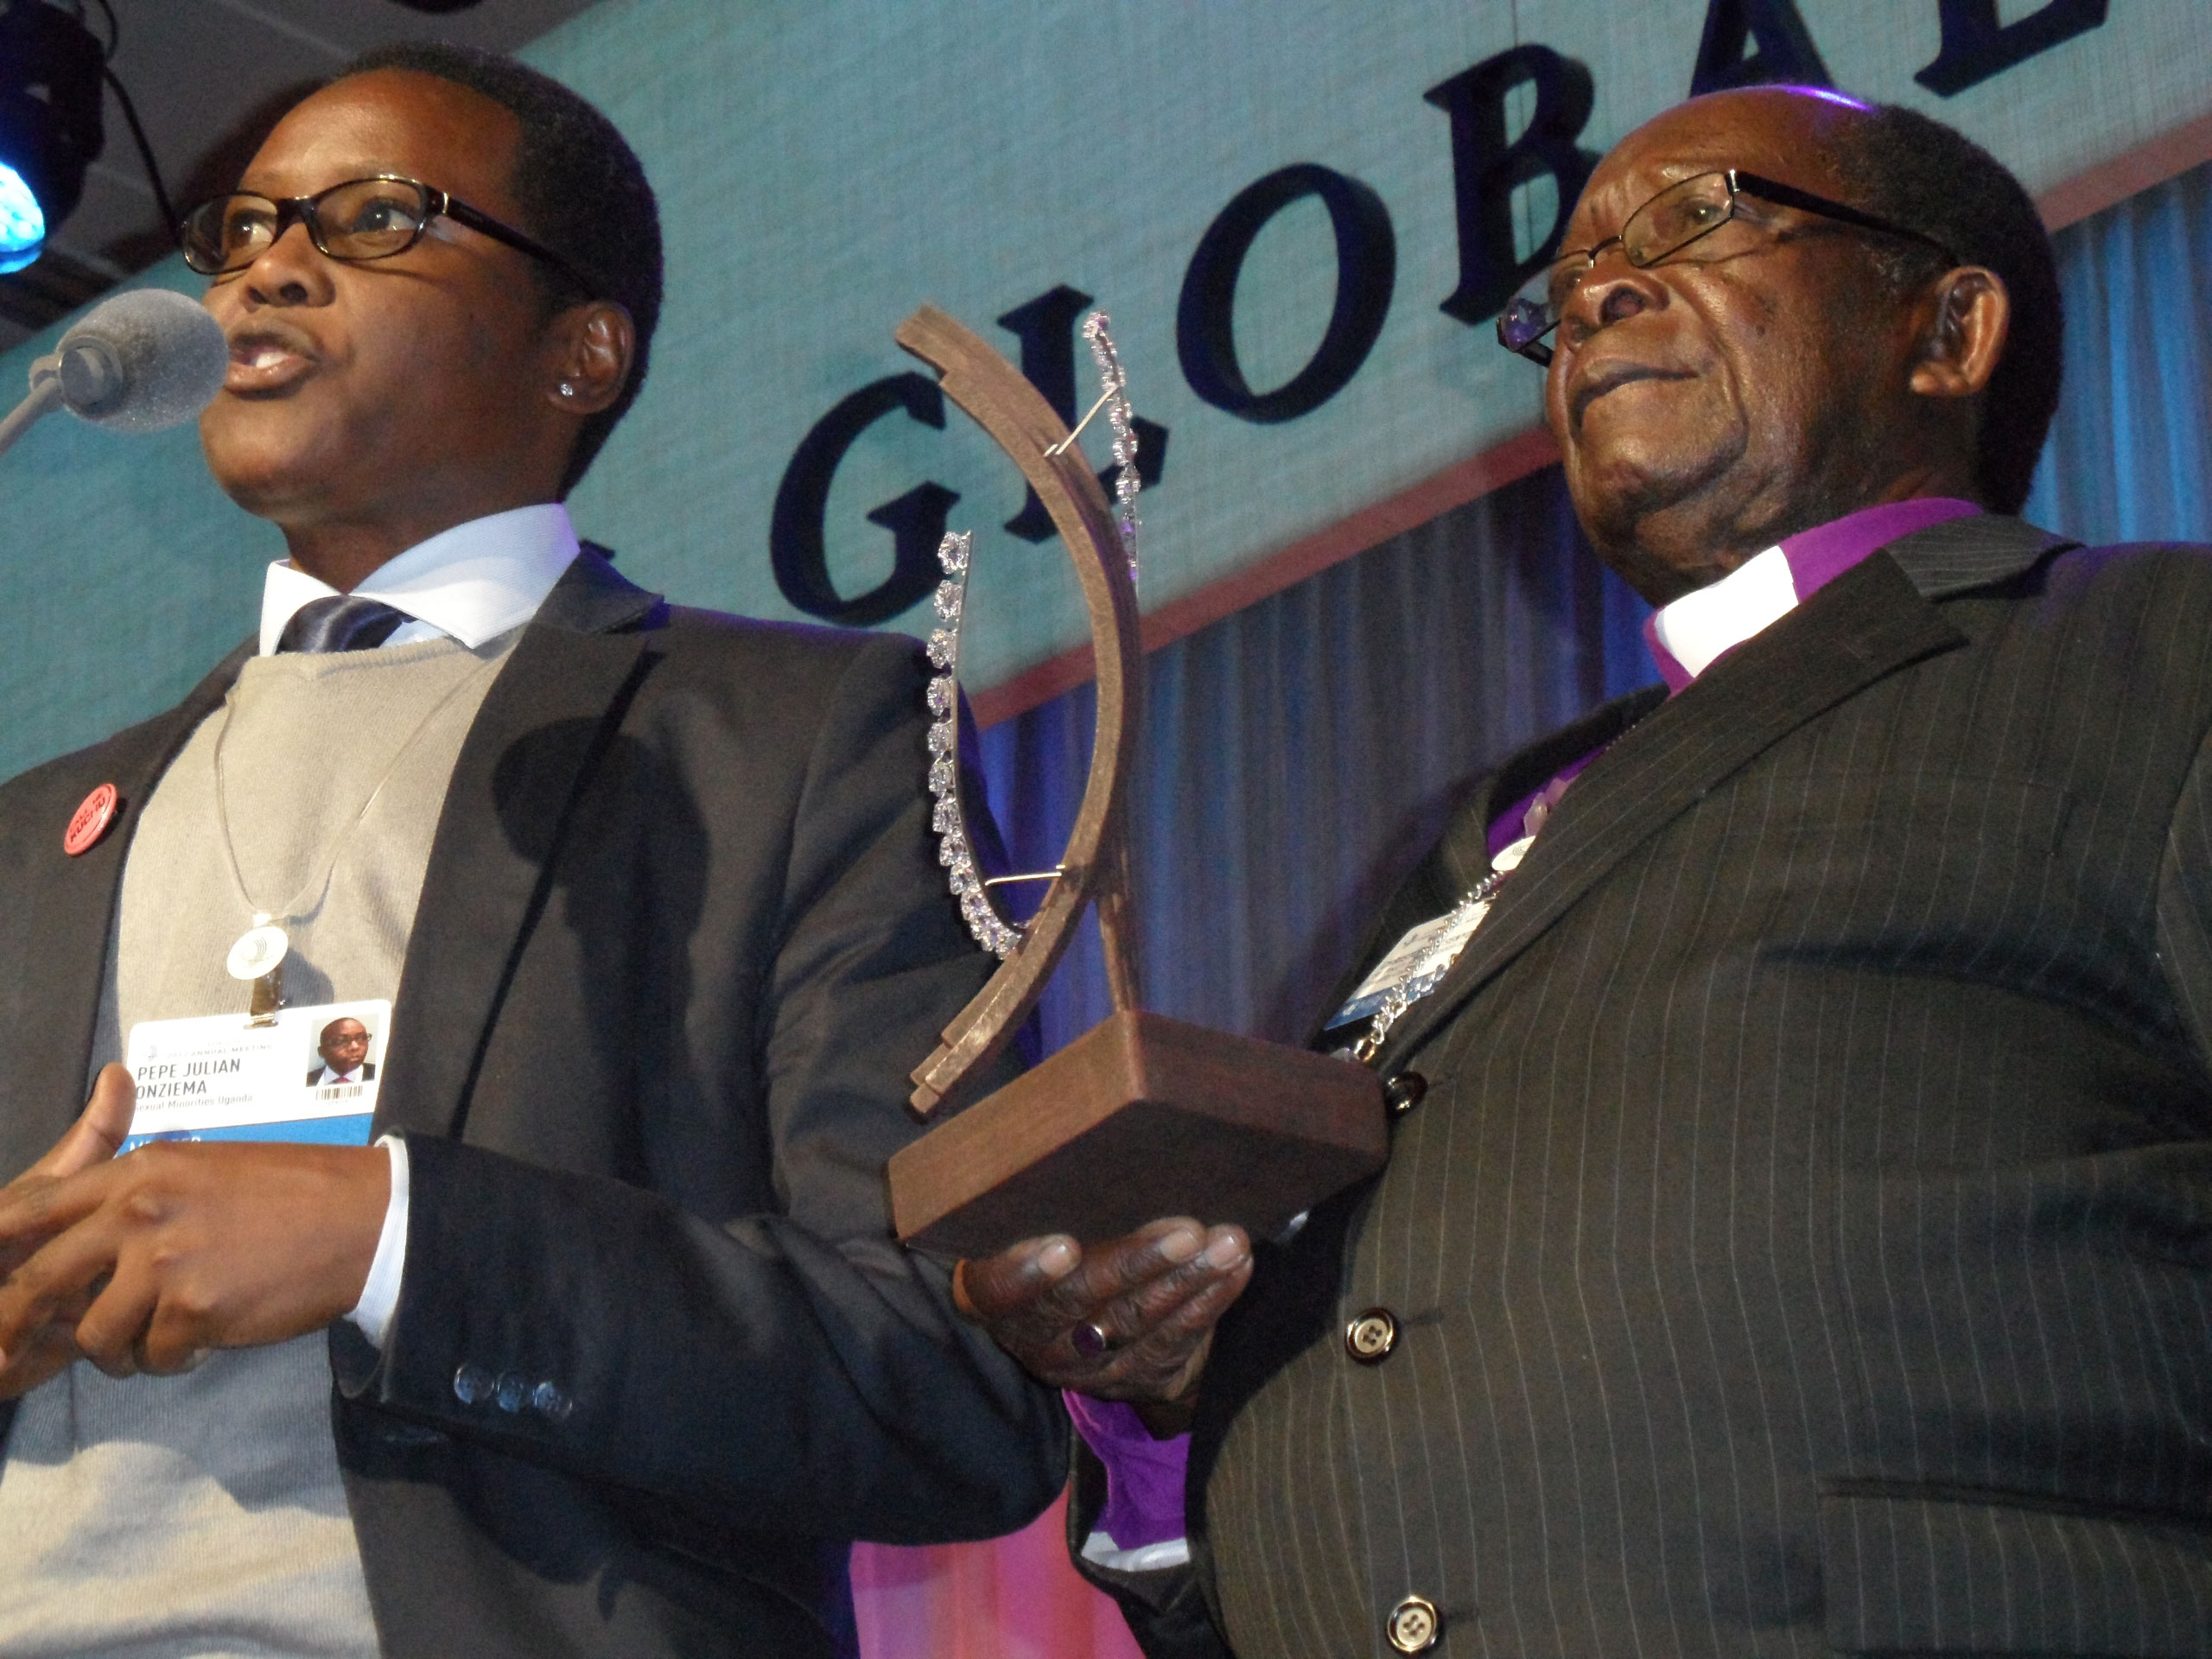 Clinton Global Citizen award winners Pepe Julius Onziema, left, and Bishop Christopher Senyonjo at Clinton Global Initiative 2012 in New York. at